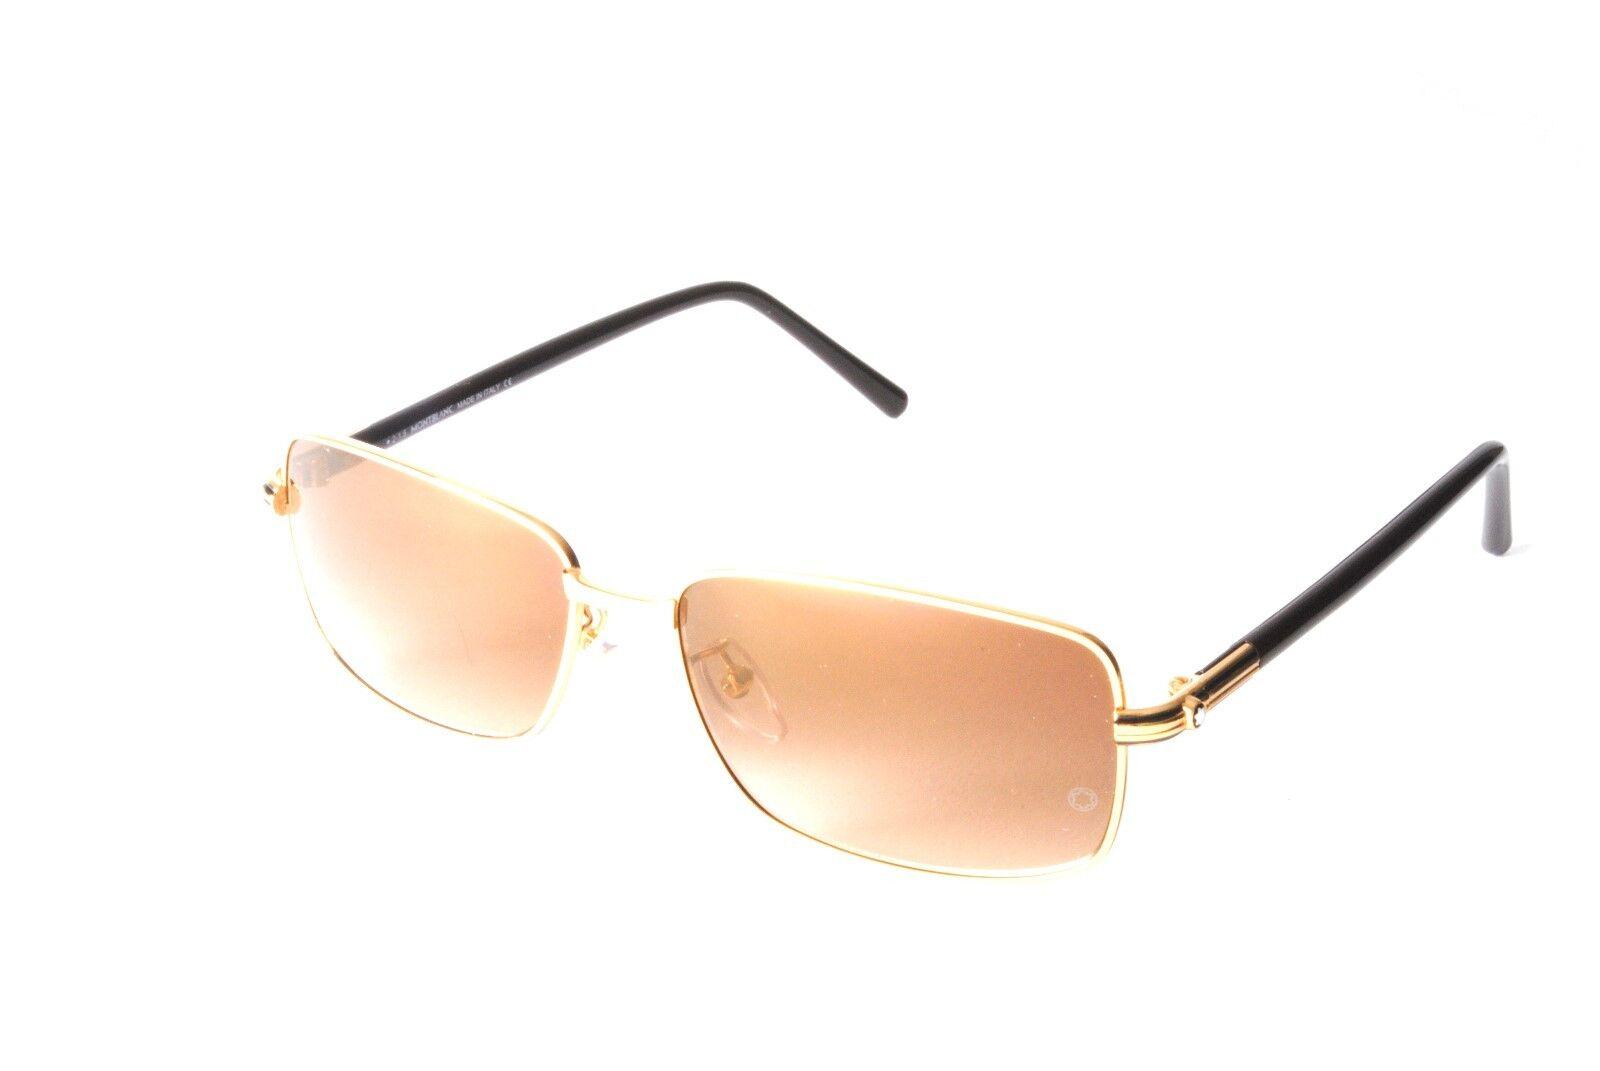 7edb5e5704 Mont Blanc MB503T S 30G Gold Brown Sunglasses